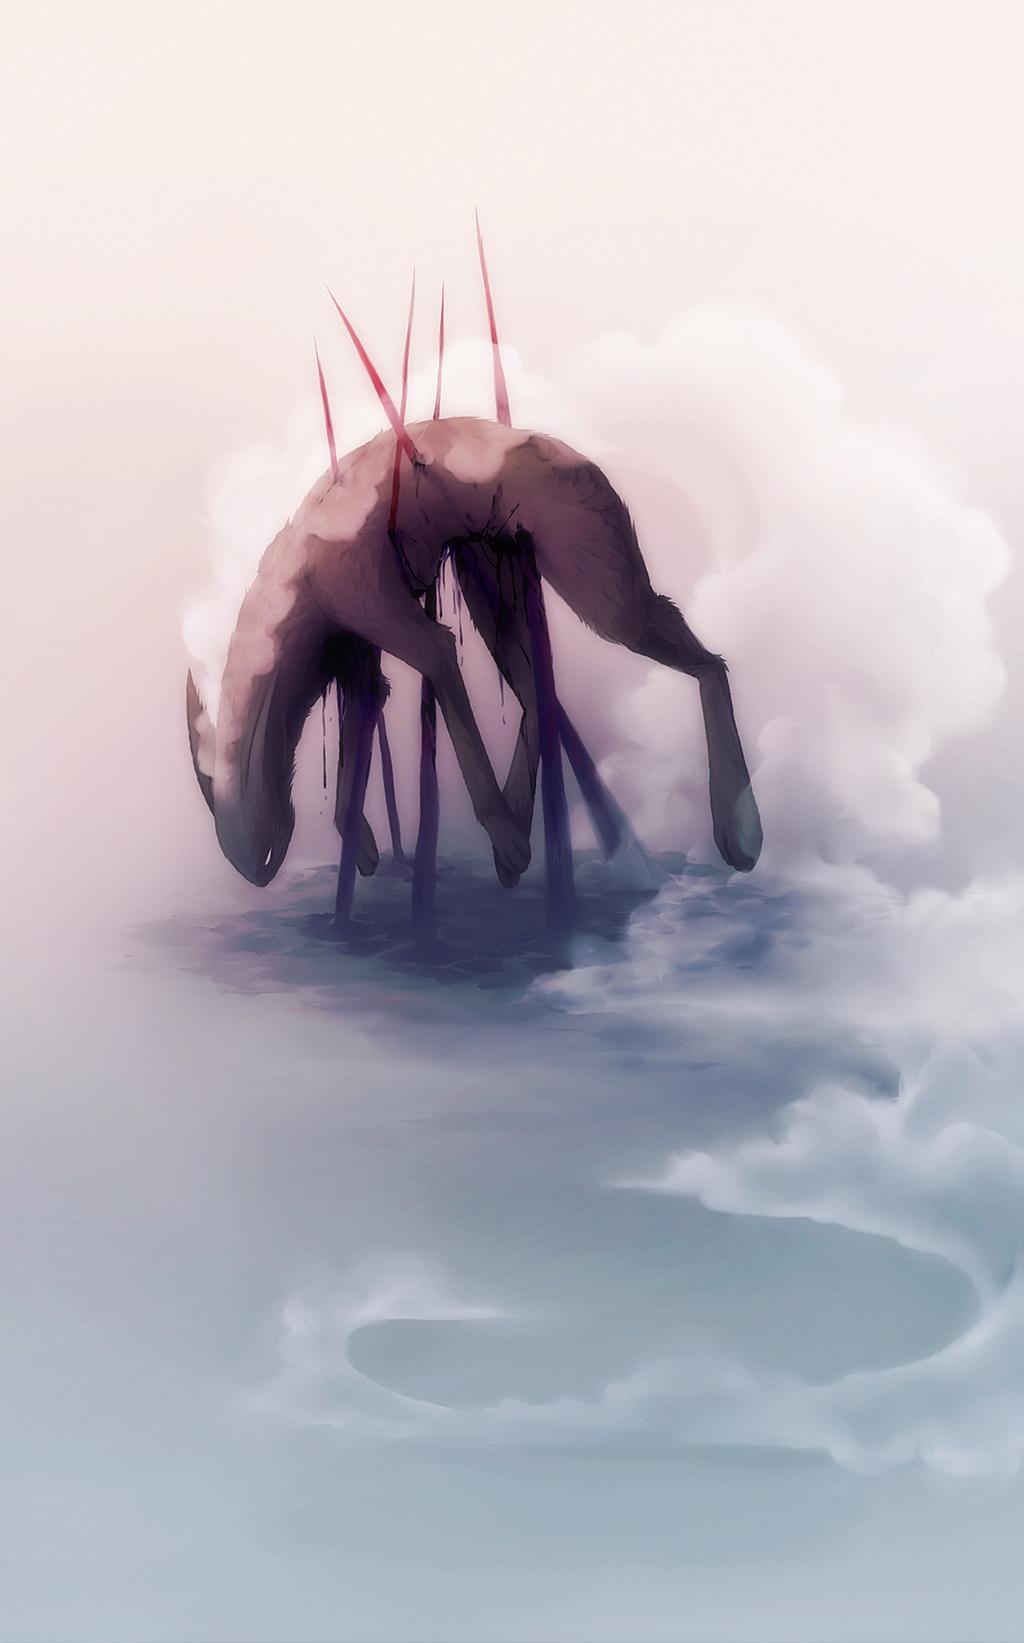 Free by Unikeko